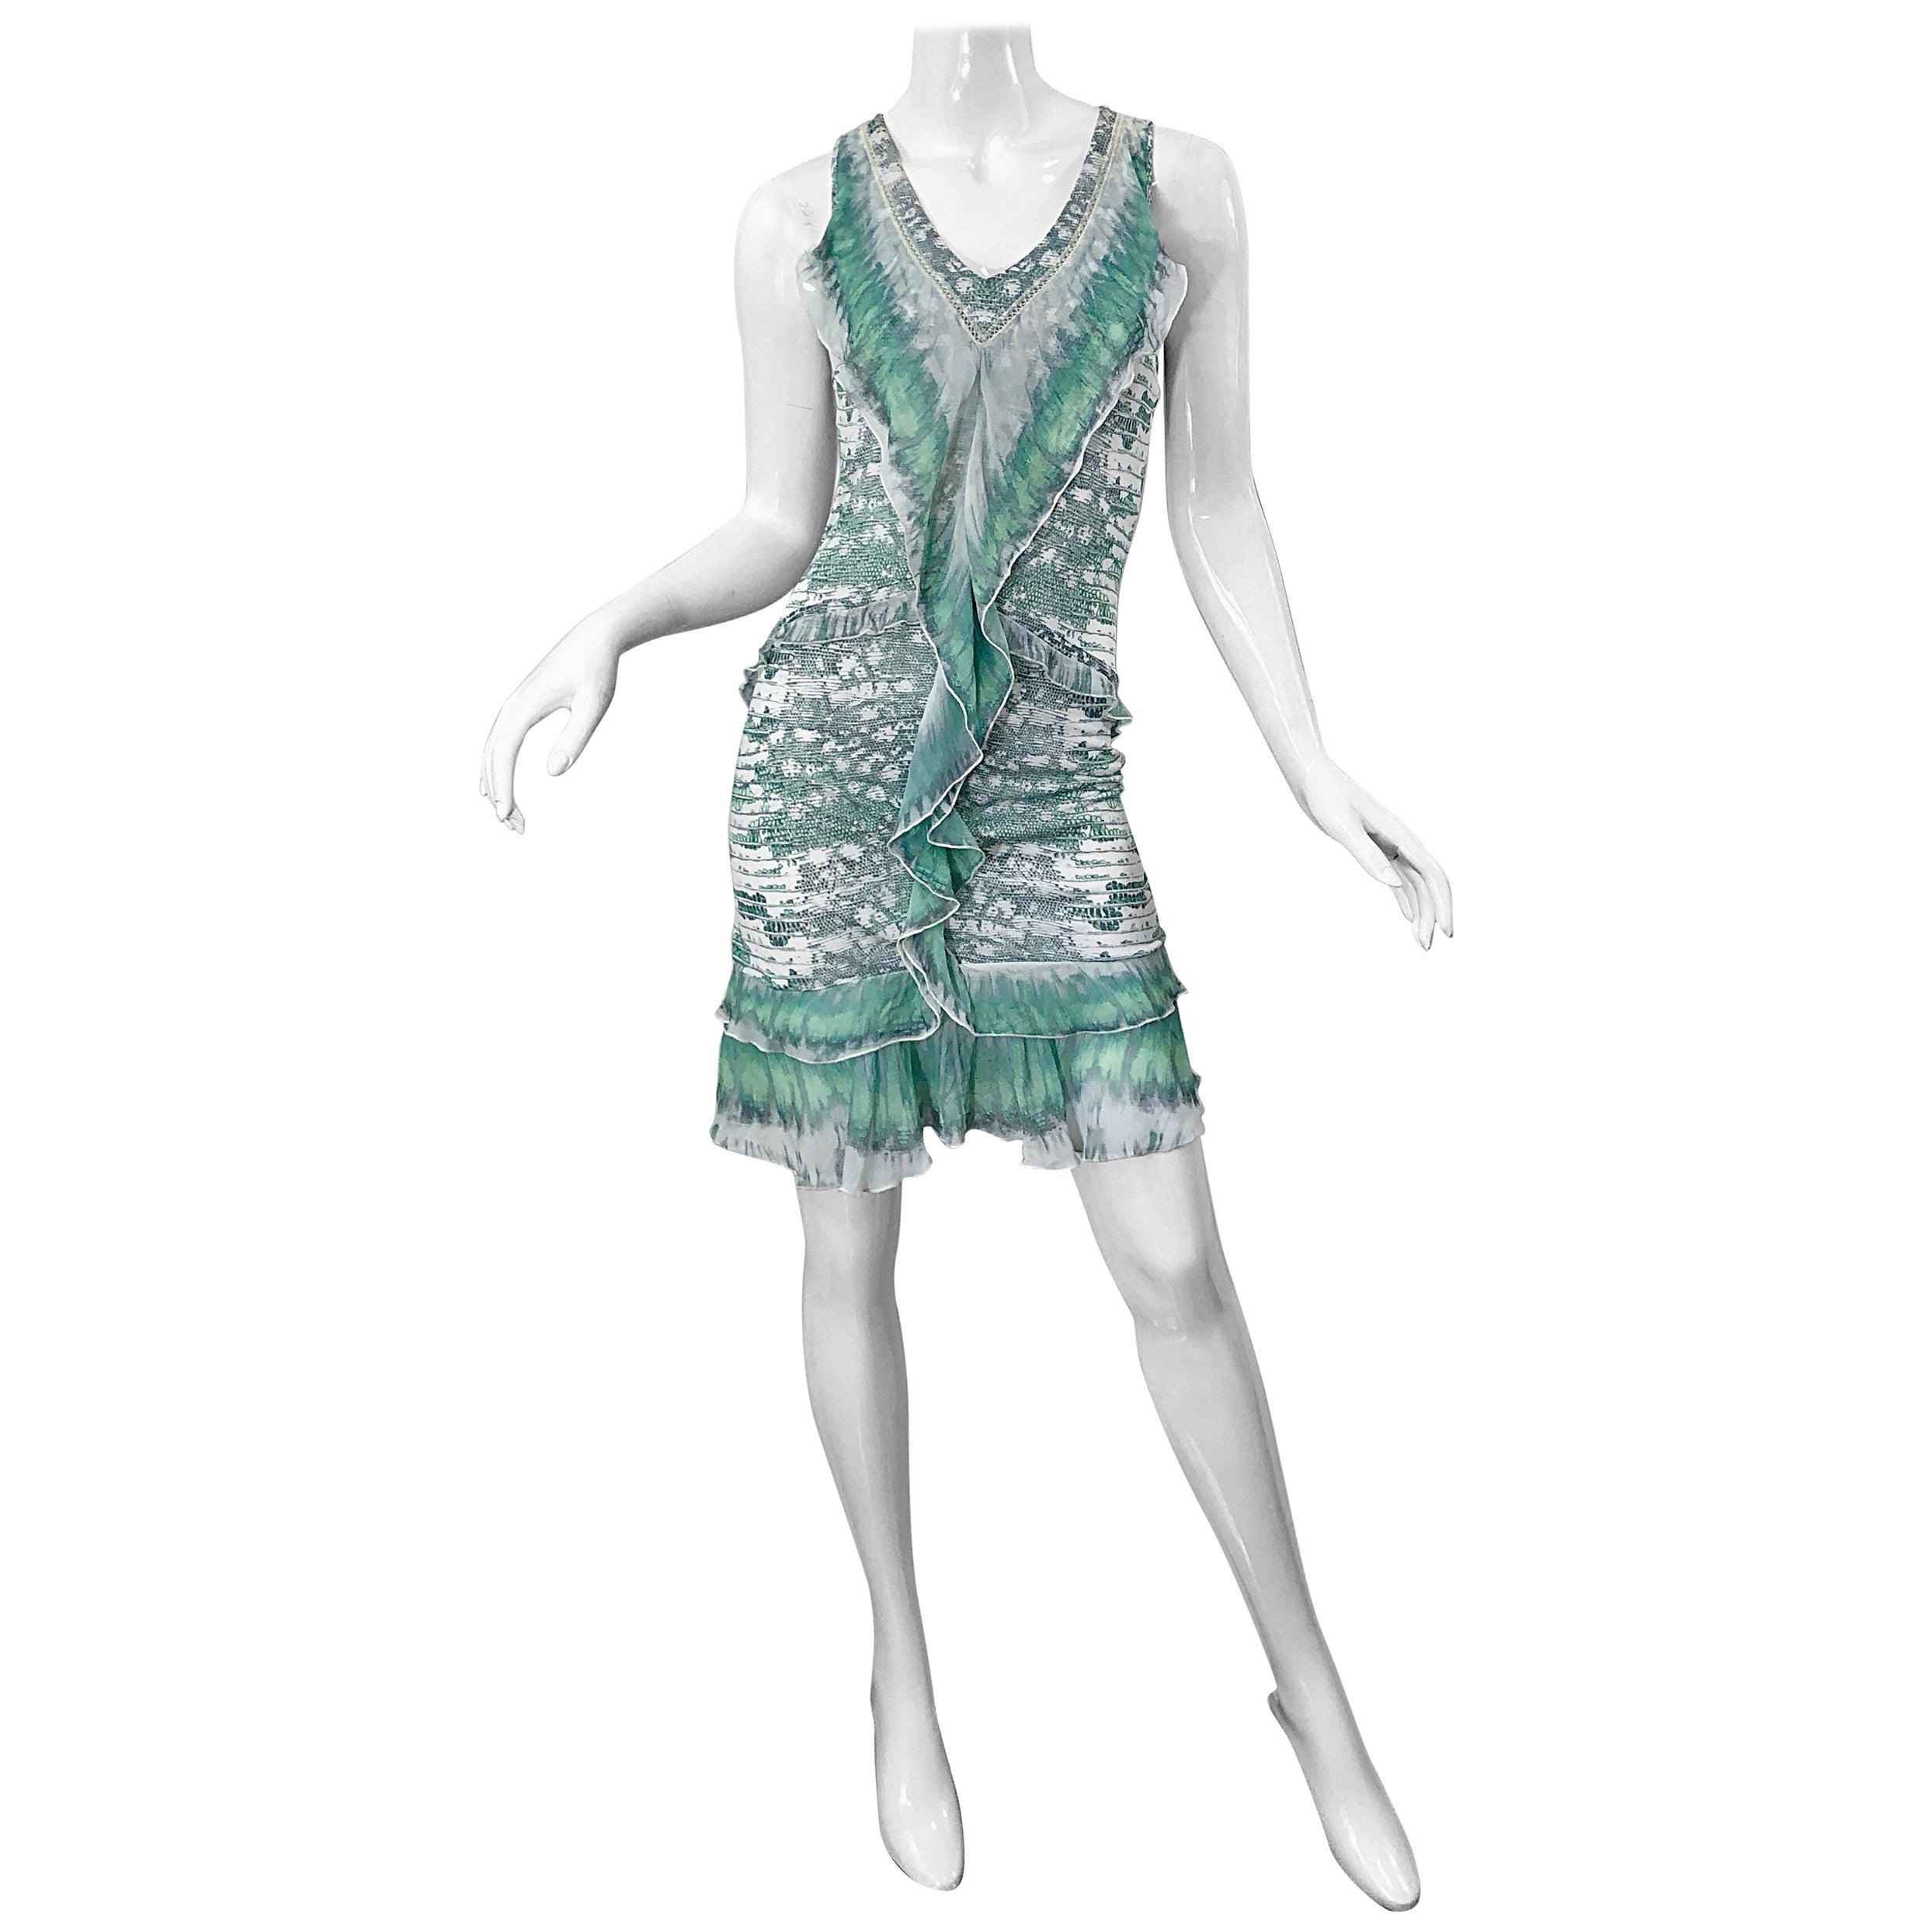 72dba753a04cd Roberto Cavalli Early 2000s Green White Snake Skin Reptile Silk Jersey Dress  at 1stdibs